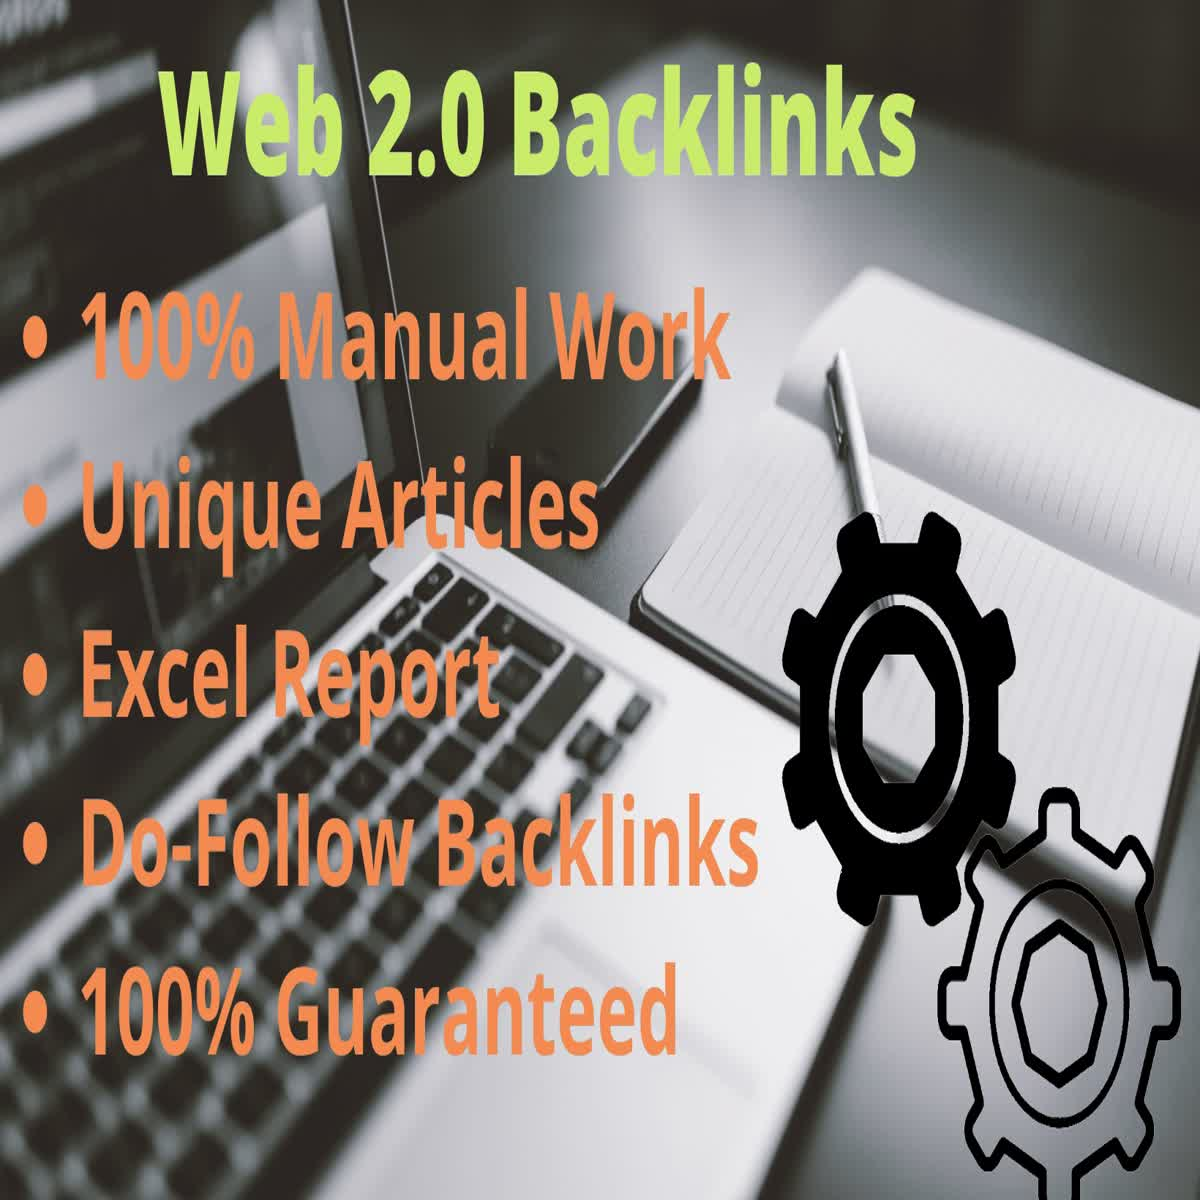 I will build 70 Web 2.0 Do-follow backlinks for you